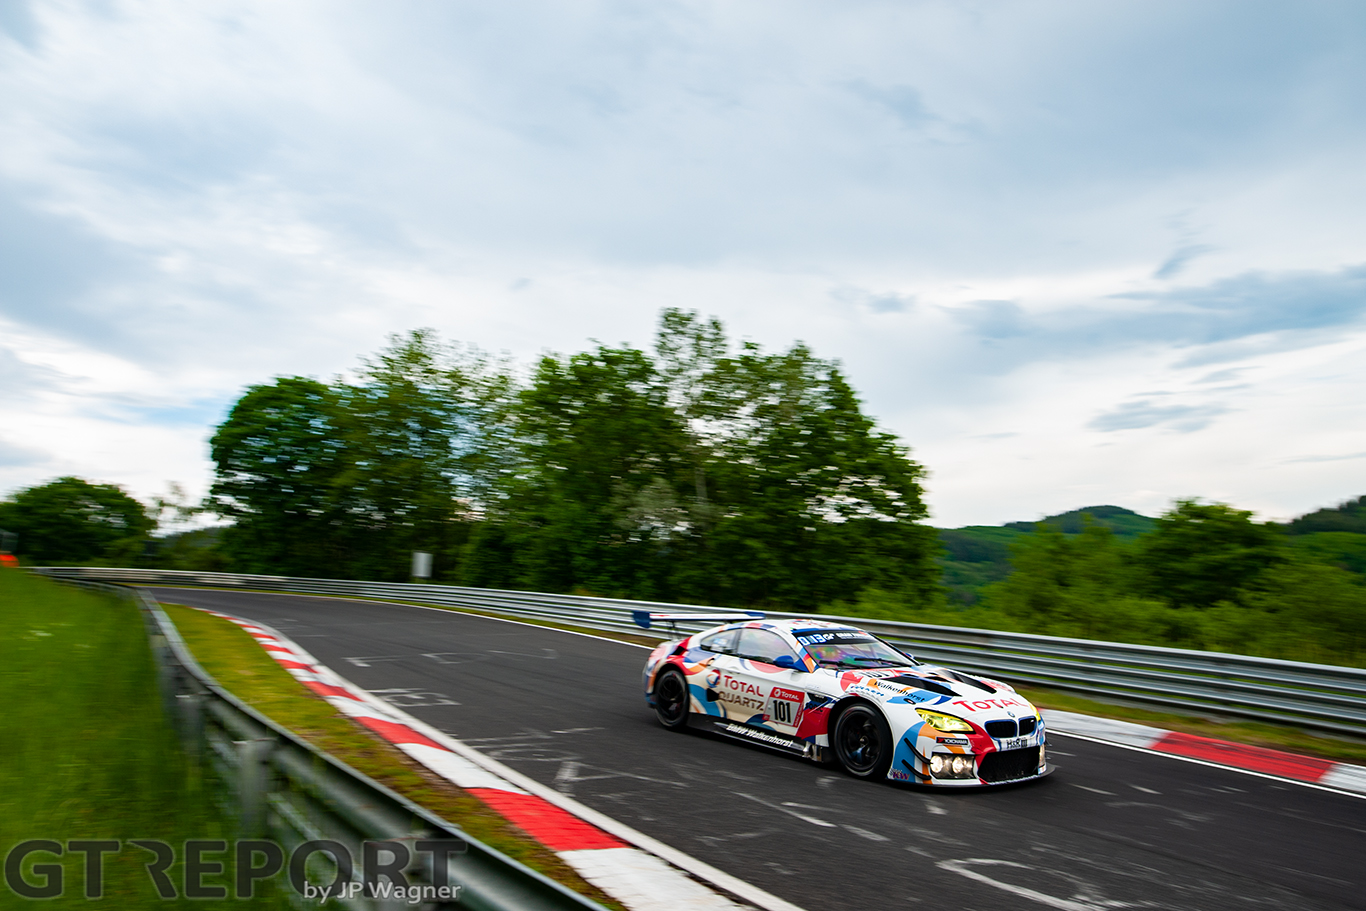 Nürburgring 24 Hours driver report: Ben Tuck – Restart to finish